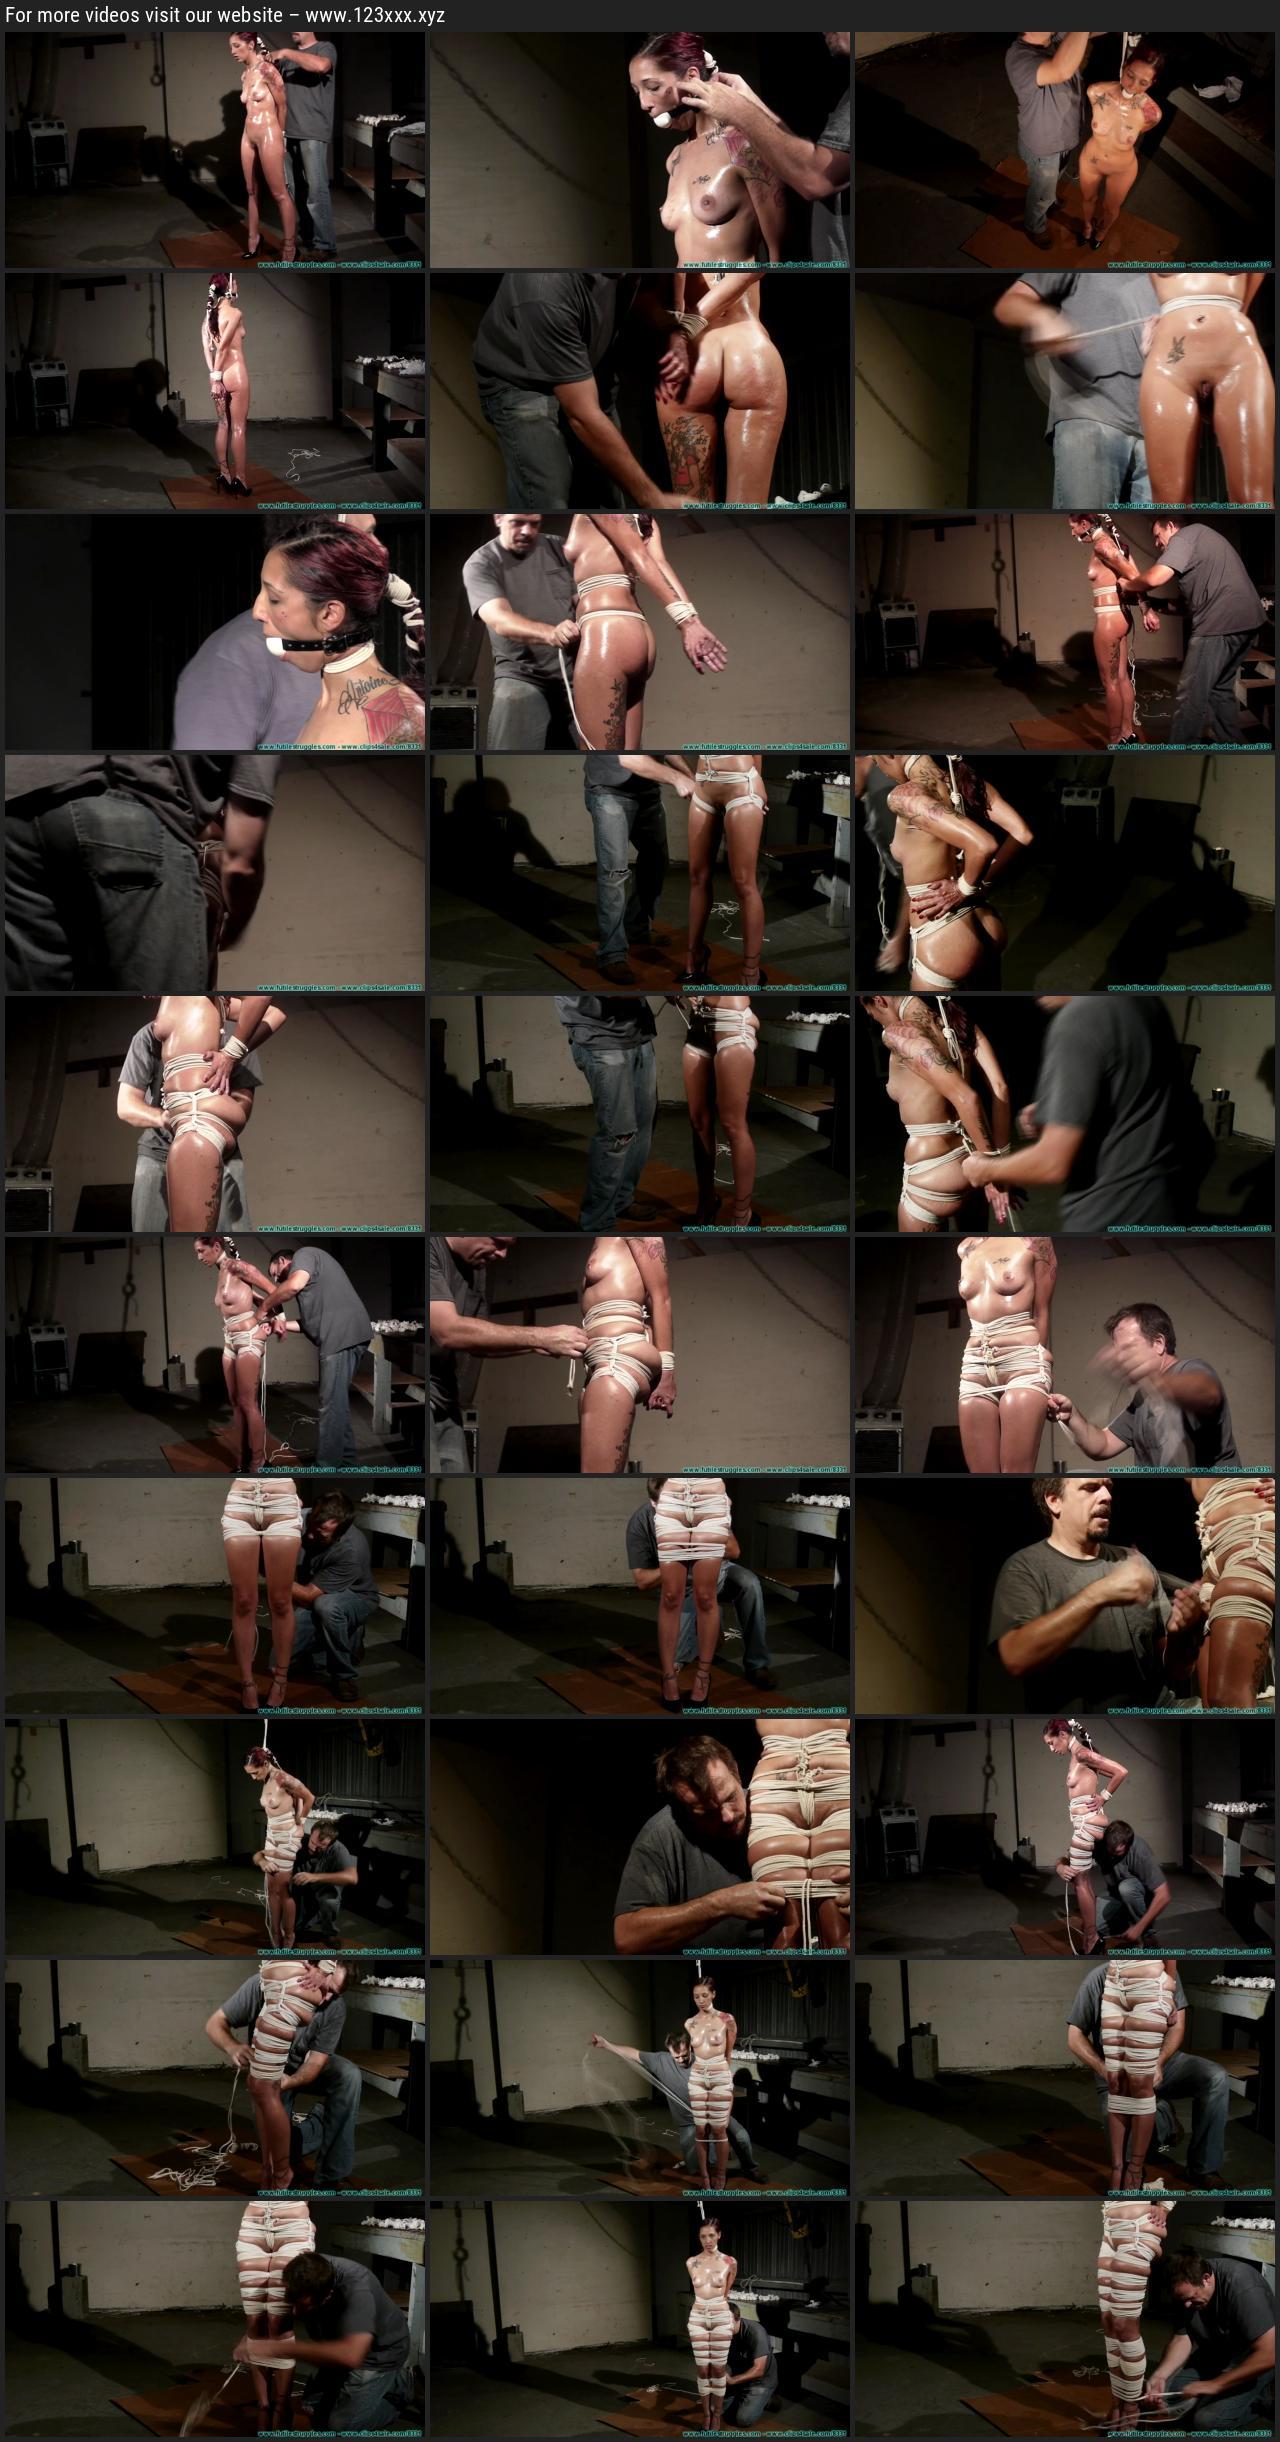 FutileStruggles.Stefania.700-Part.1.XXX.720p.MP4-hUSHhUSH_thumbs.jpg